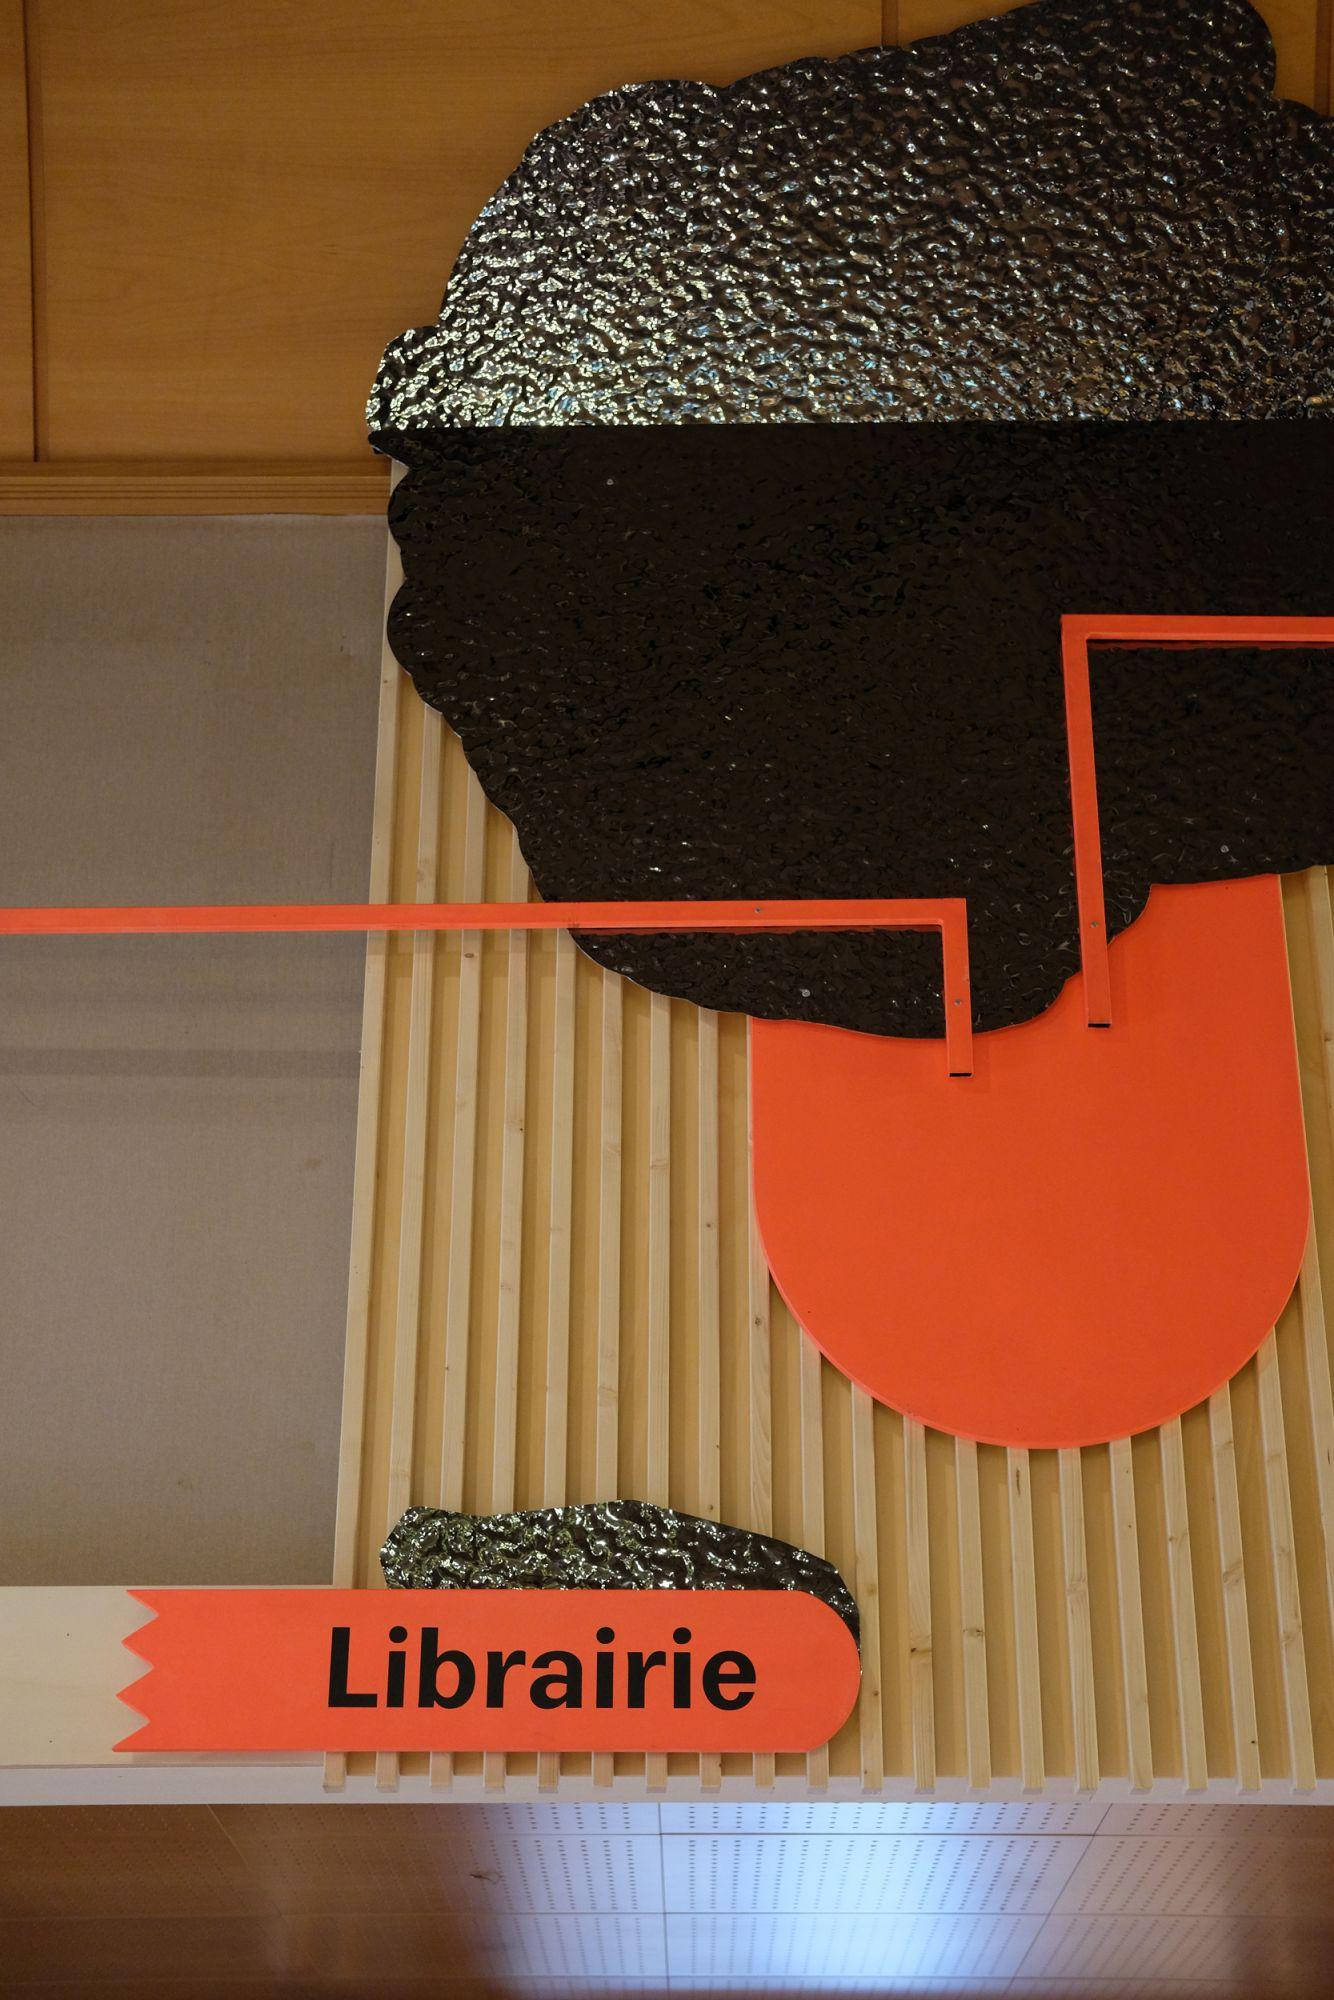 Le Grand T - Librairie - Changements - Yohann Olivier et Romain Rambaud